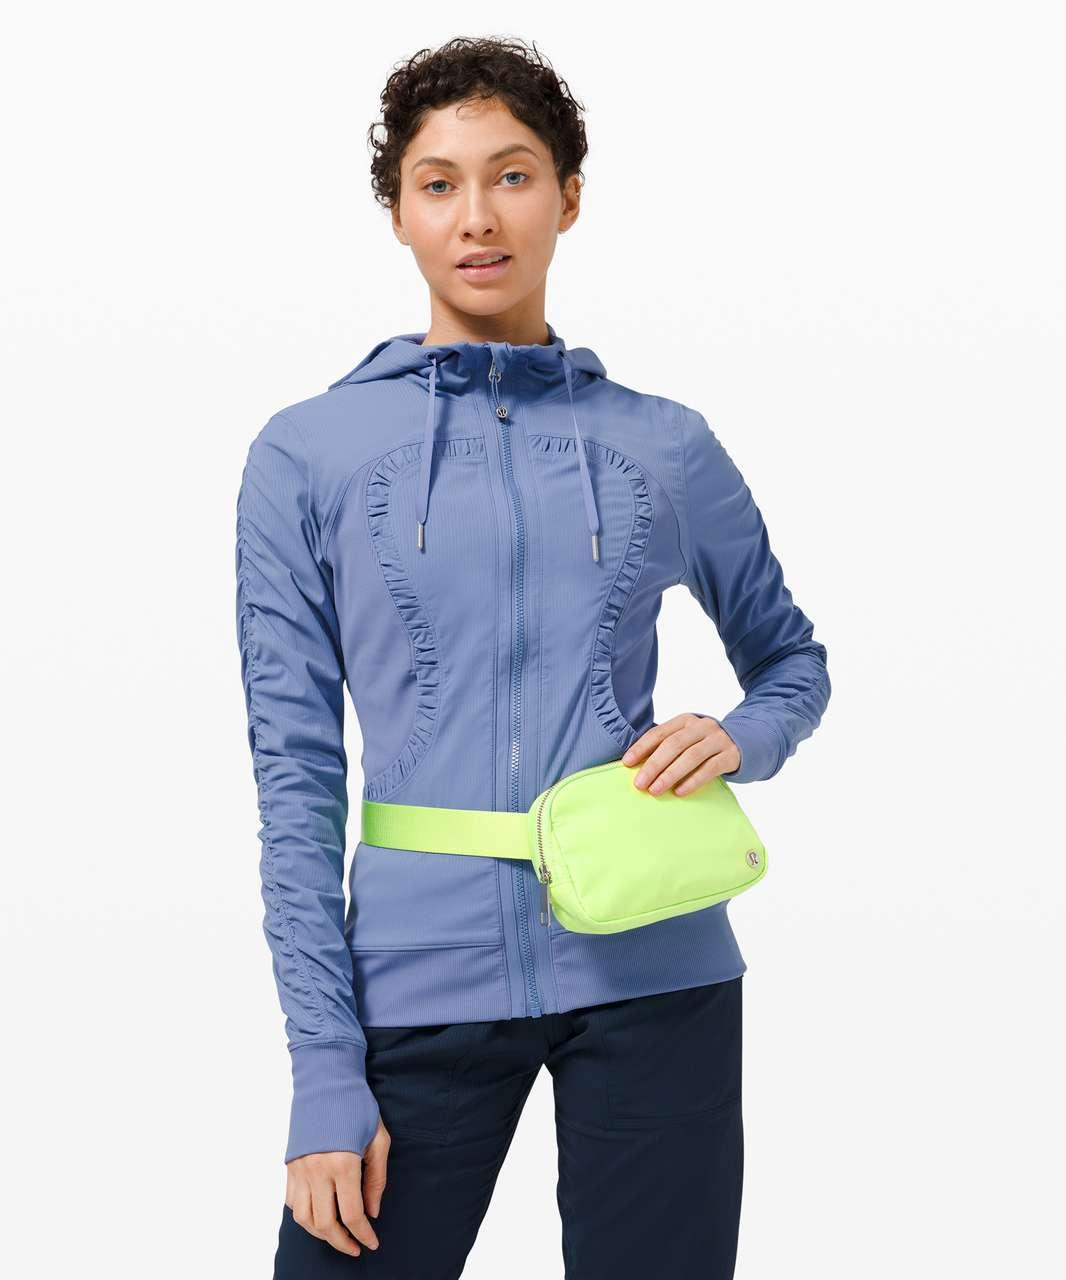 Lululemon Everywhere Belt Bag *1L - Neo Mint